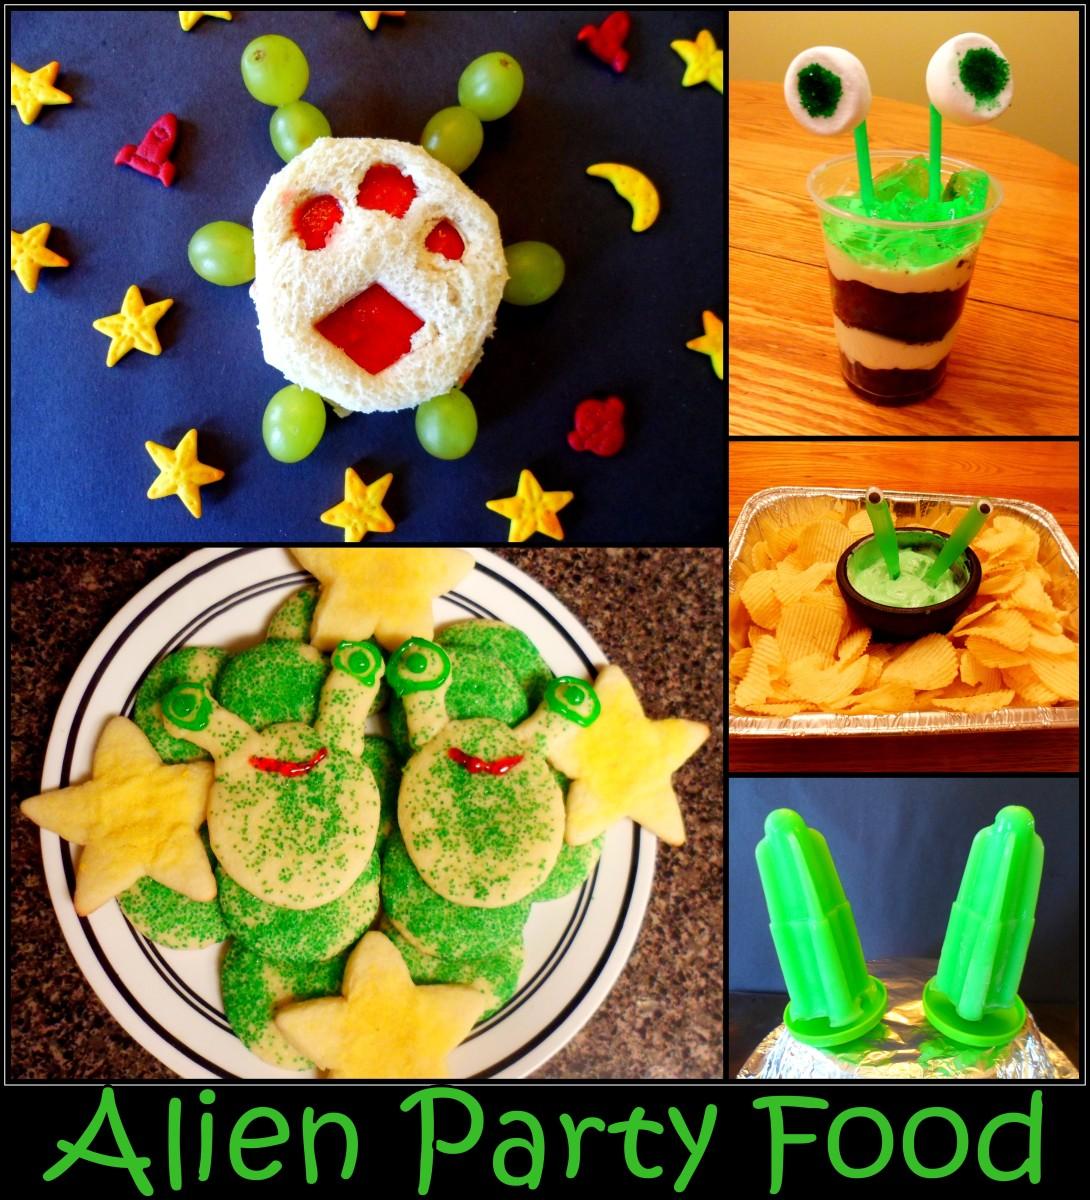 Alien Party Food Recipes